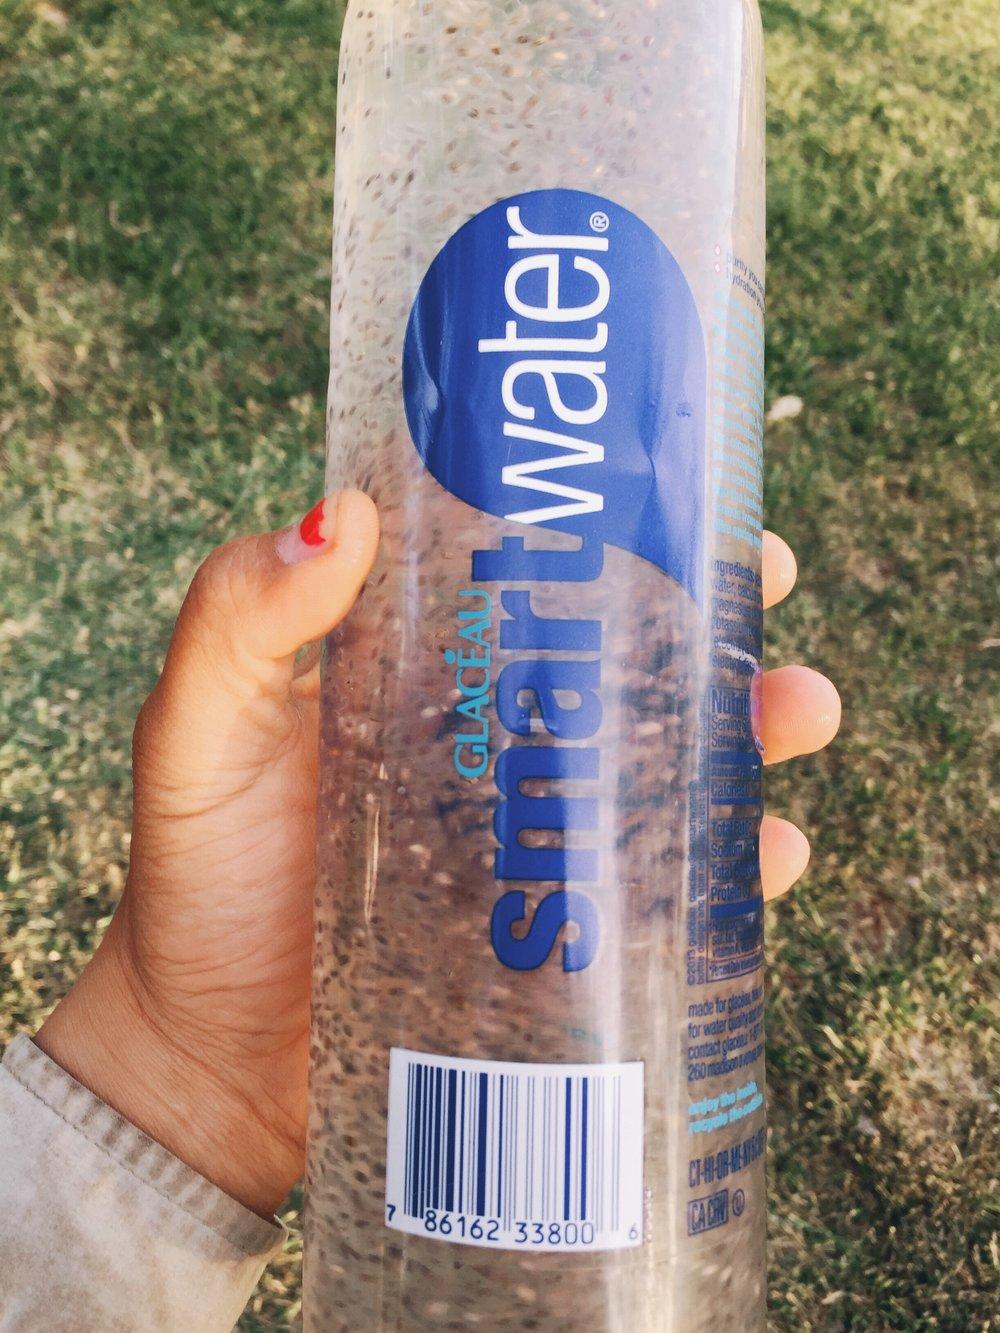 Chia water.